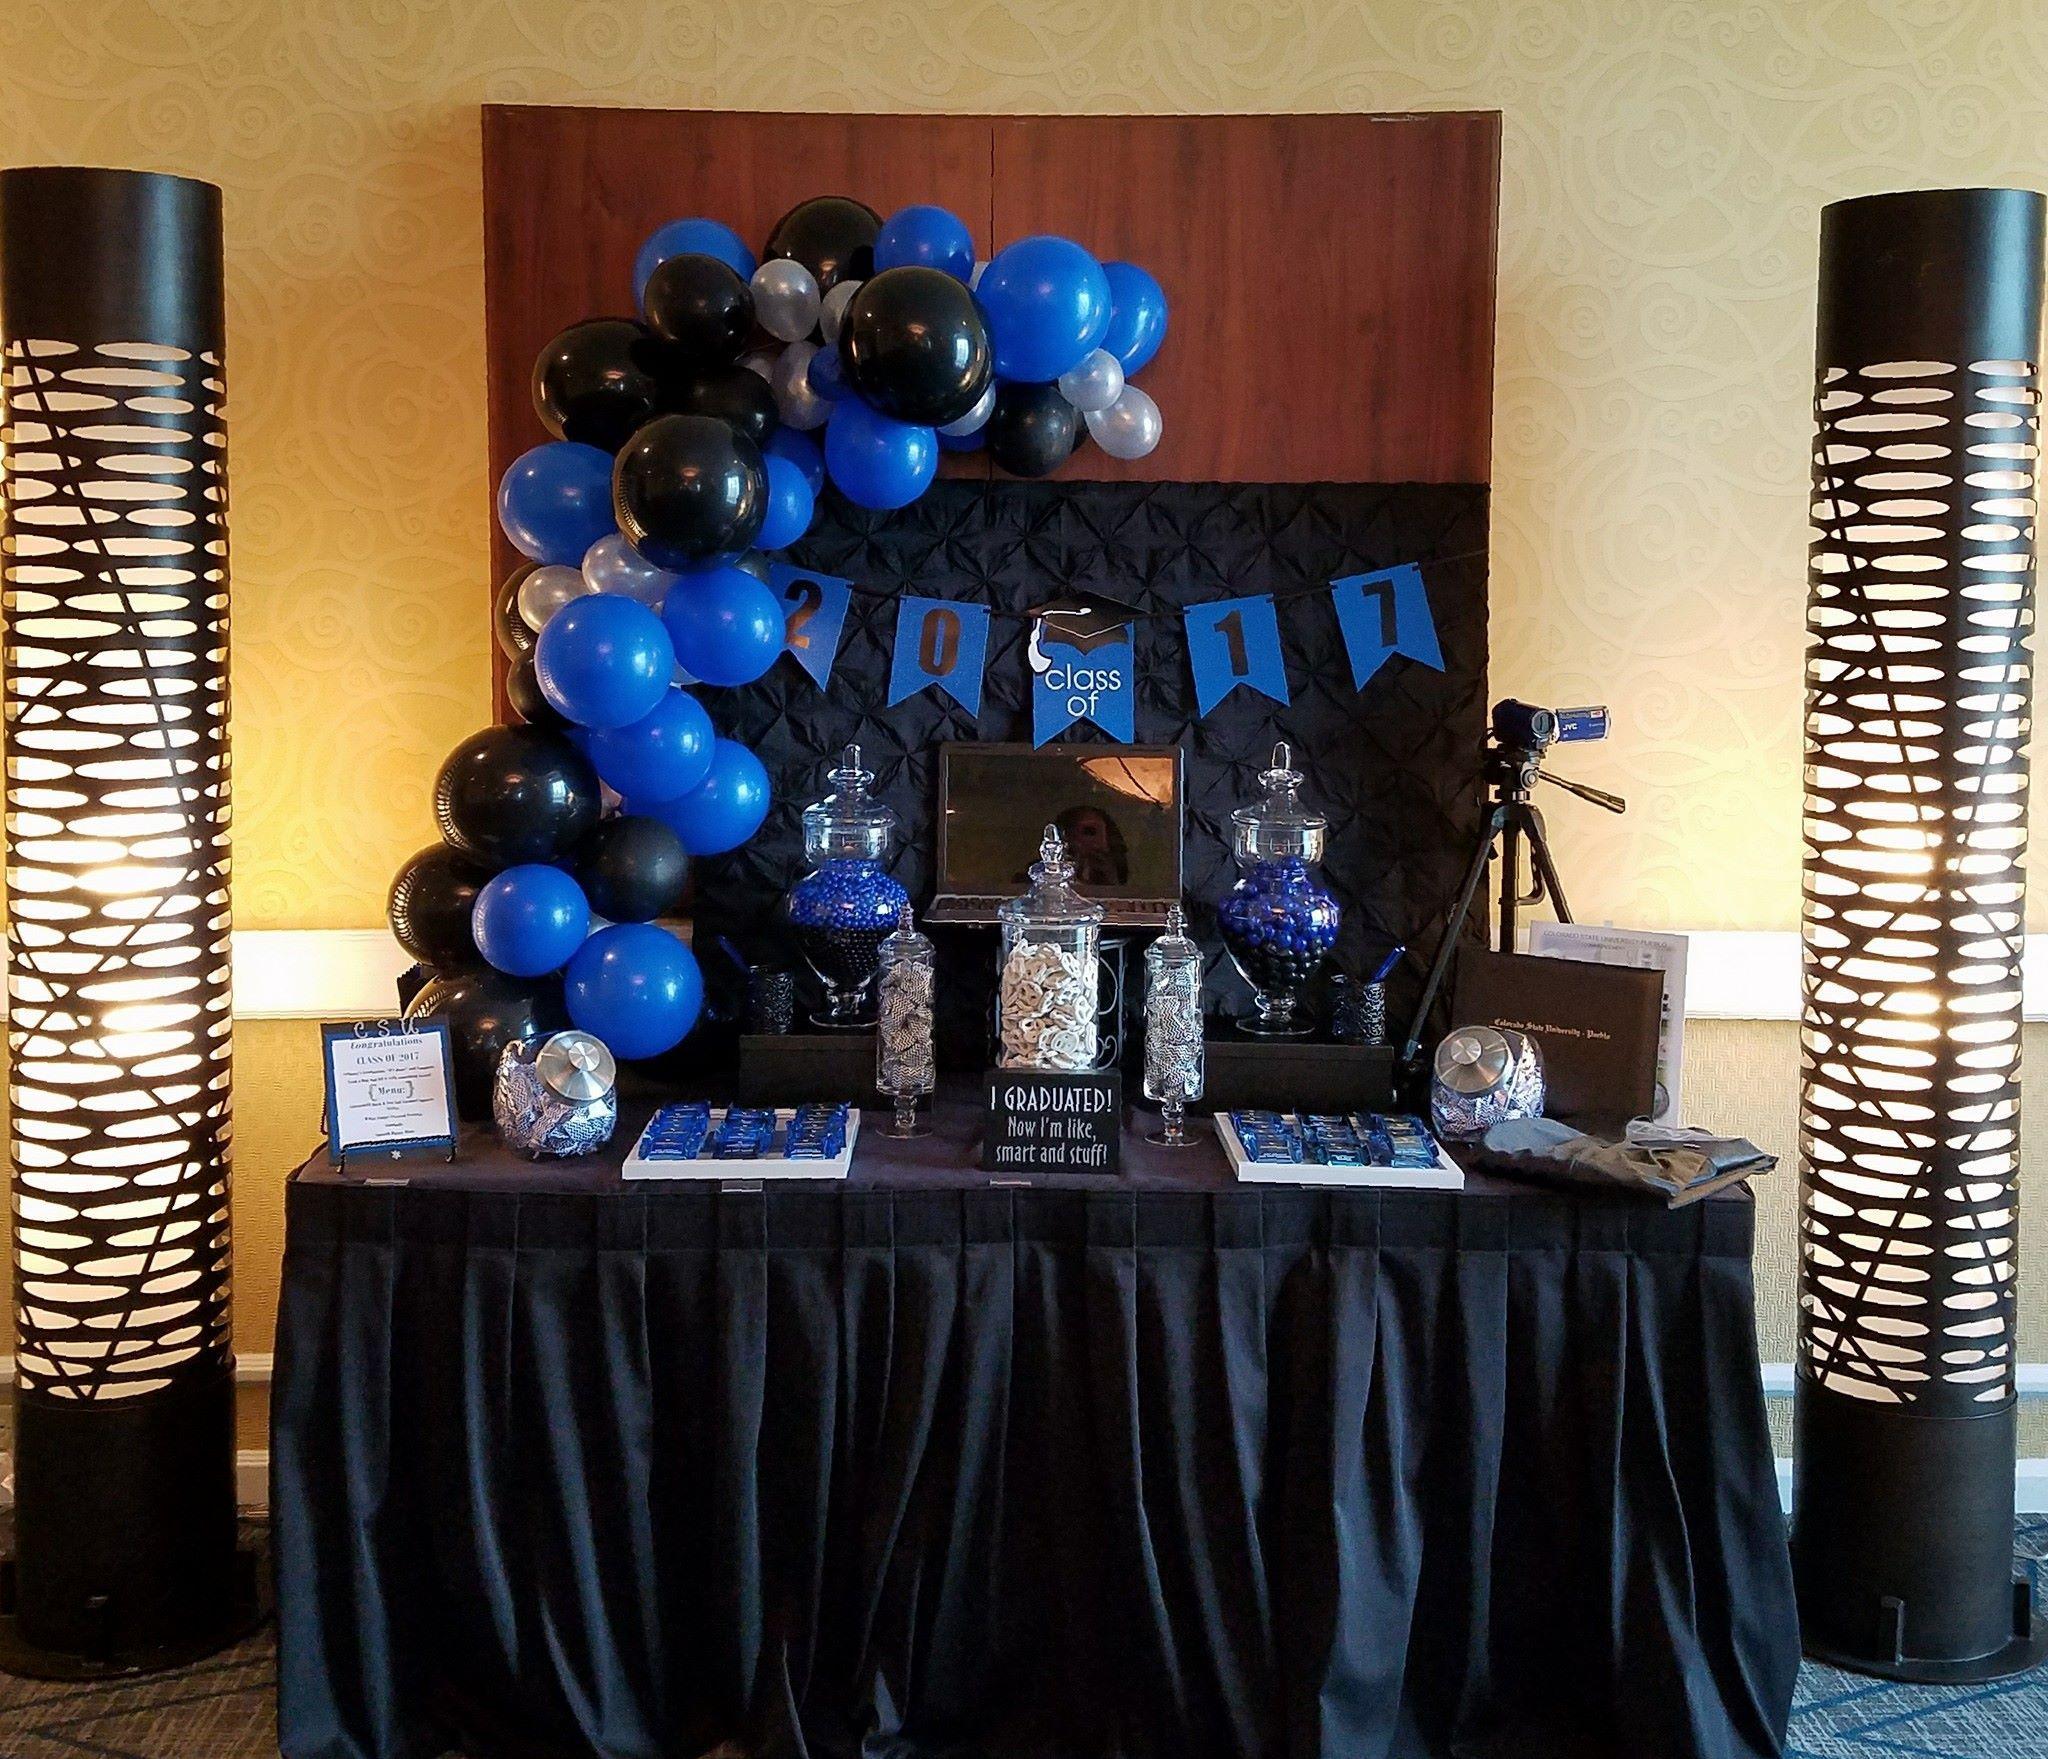 Mass Communications Graduate Sweet Treat Table Black Party Decorations Blue Graduation Party Blue Party Decorations